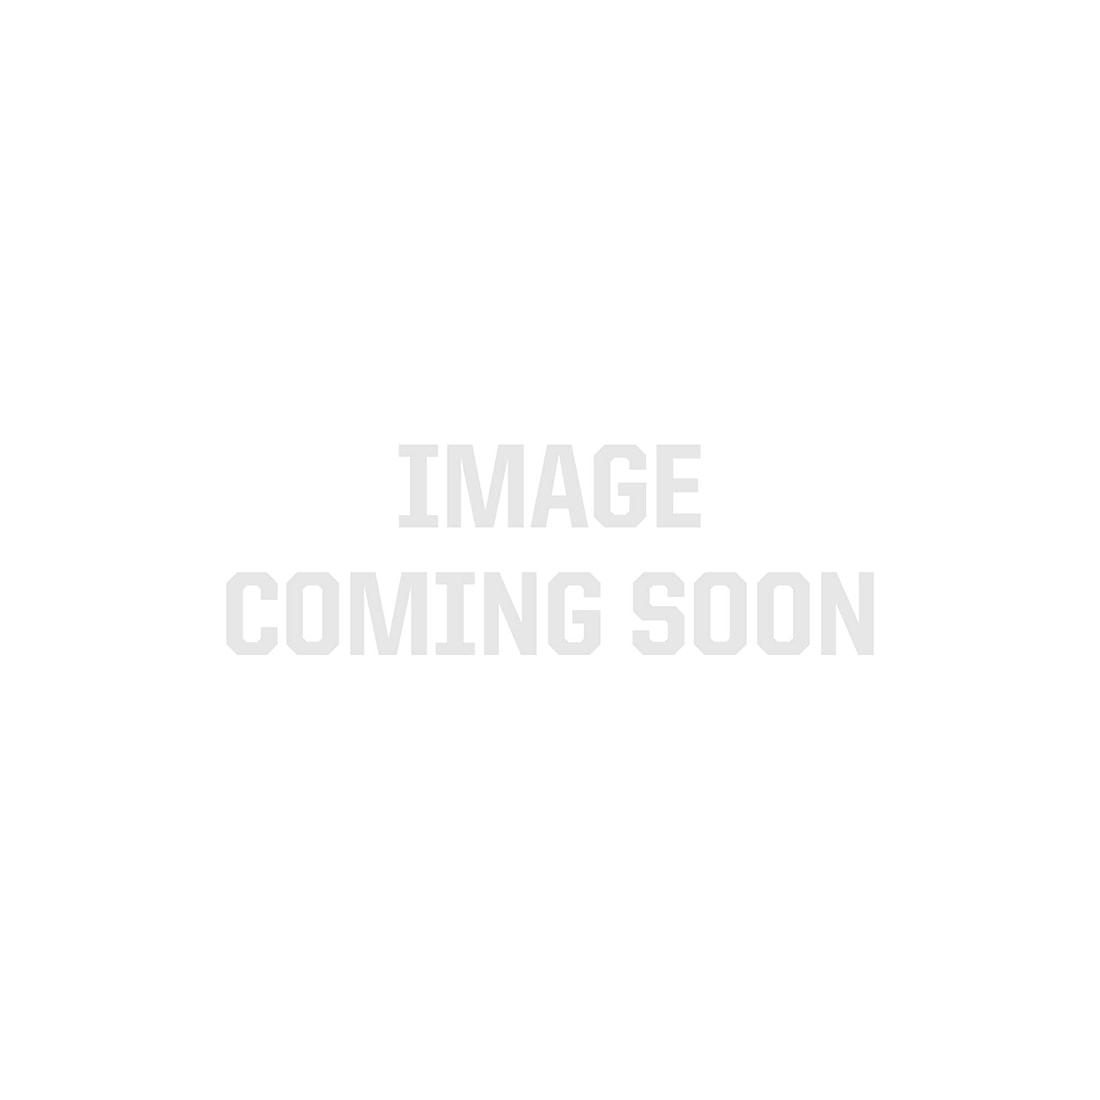 TruColor 2835 LED Strip Light - 3,000K - 80/m - CurrentControl - 10m Reel